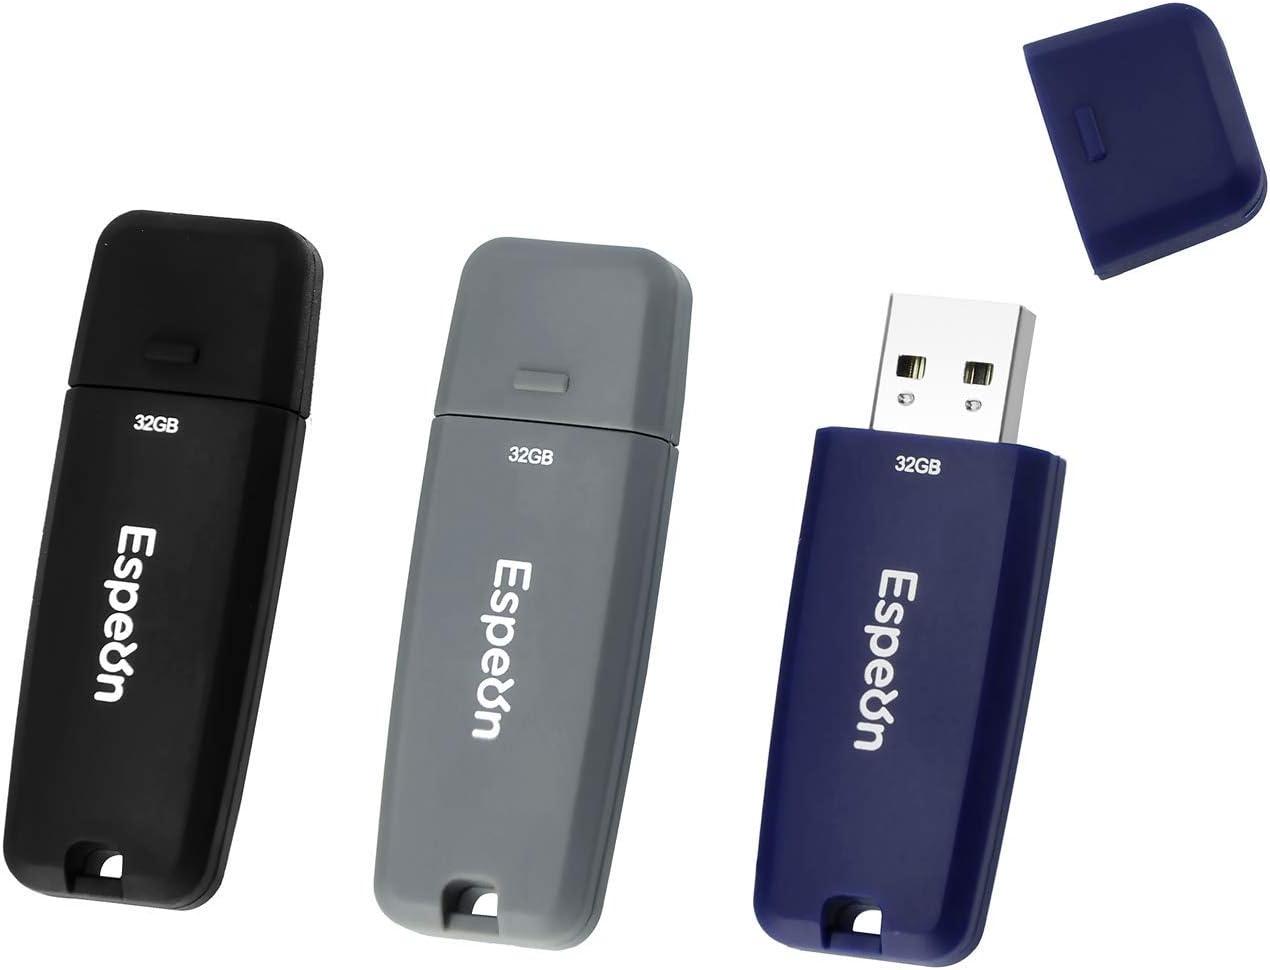 ESP32G3PKB Espeon 3-Pack 32GB USB 2.0 Flash Drive Dark Grey Business Colors Black Navy Blue